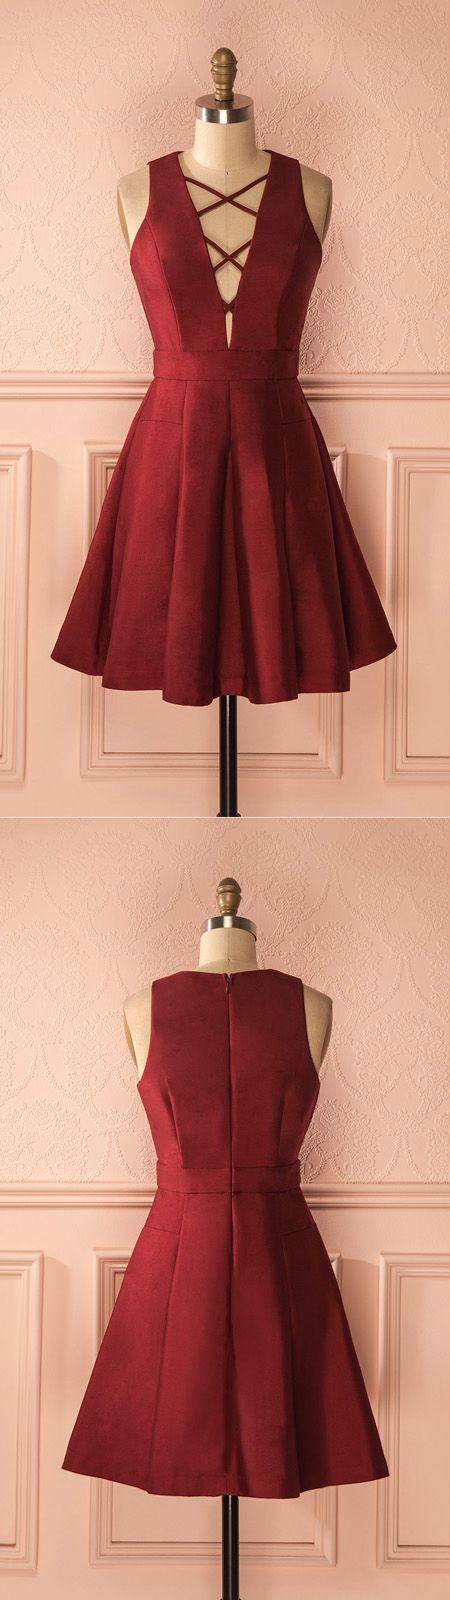 short homecoming dress,homeocming dresses,2017 homecoming dress, red homecoming dress